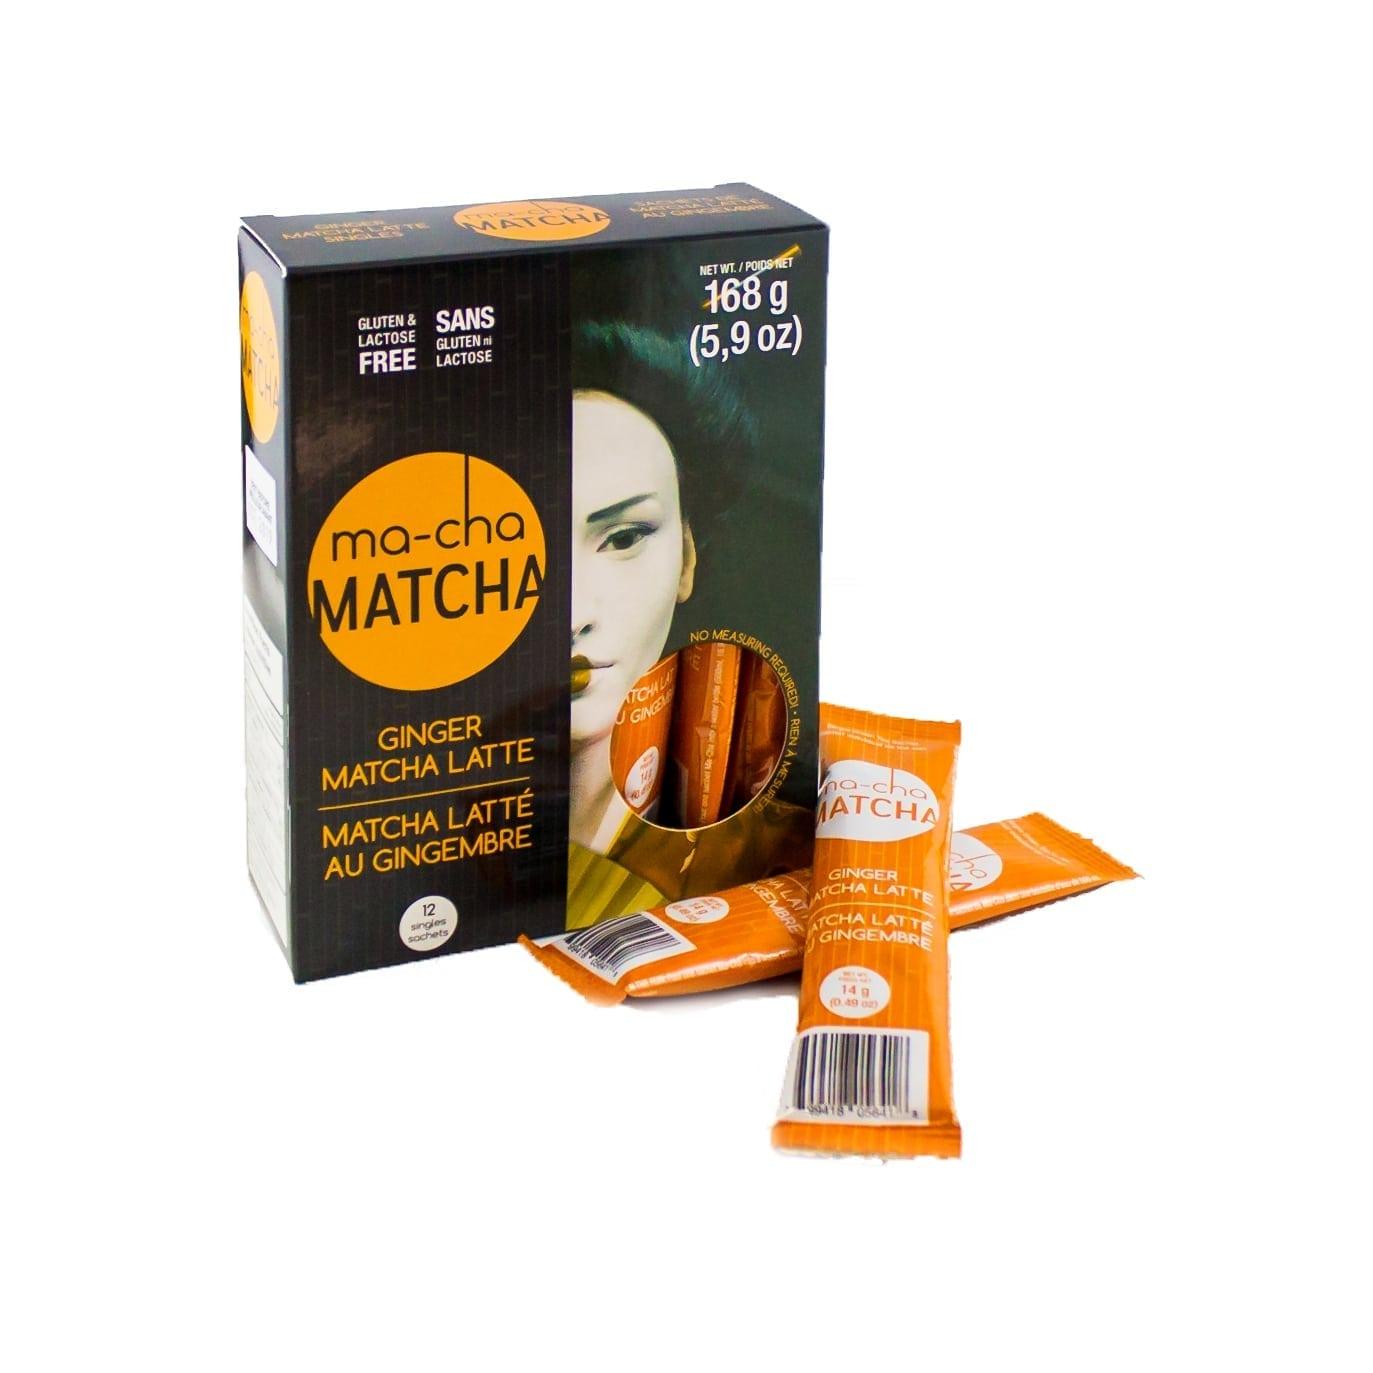 Ginger-Ma-cha-Sticks-9708 copy